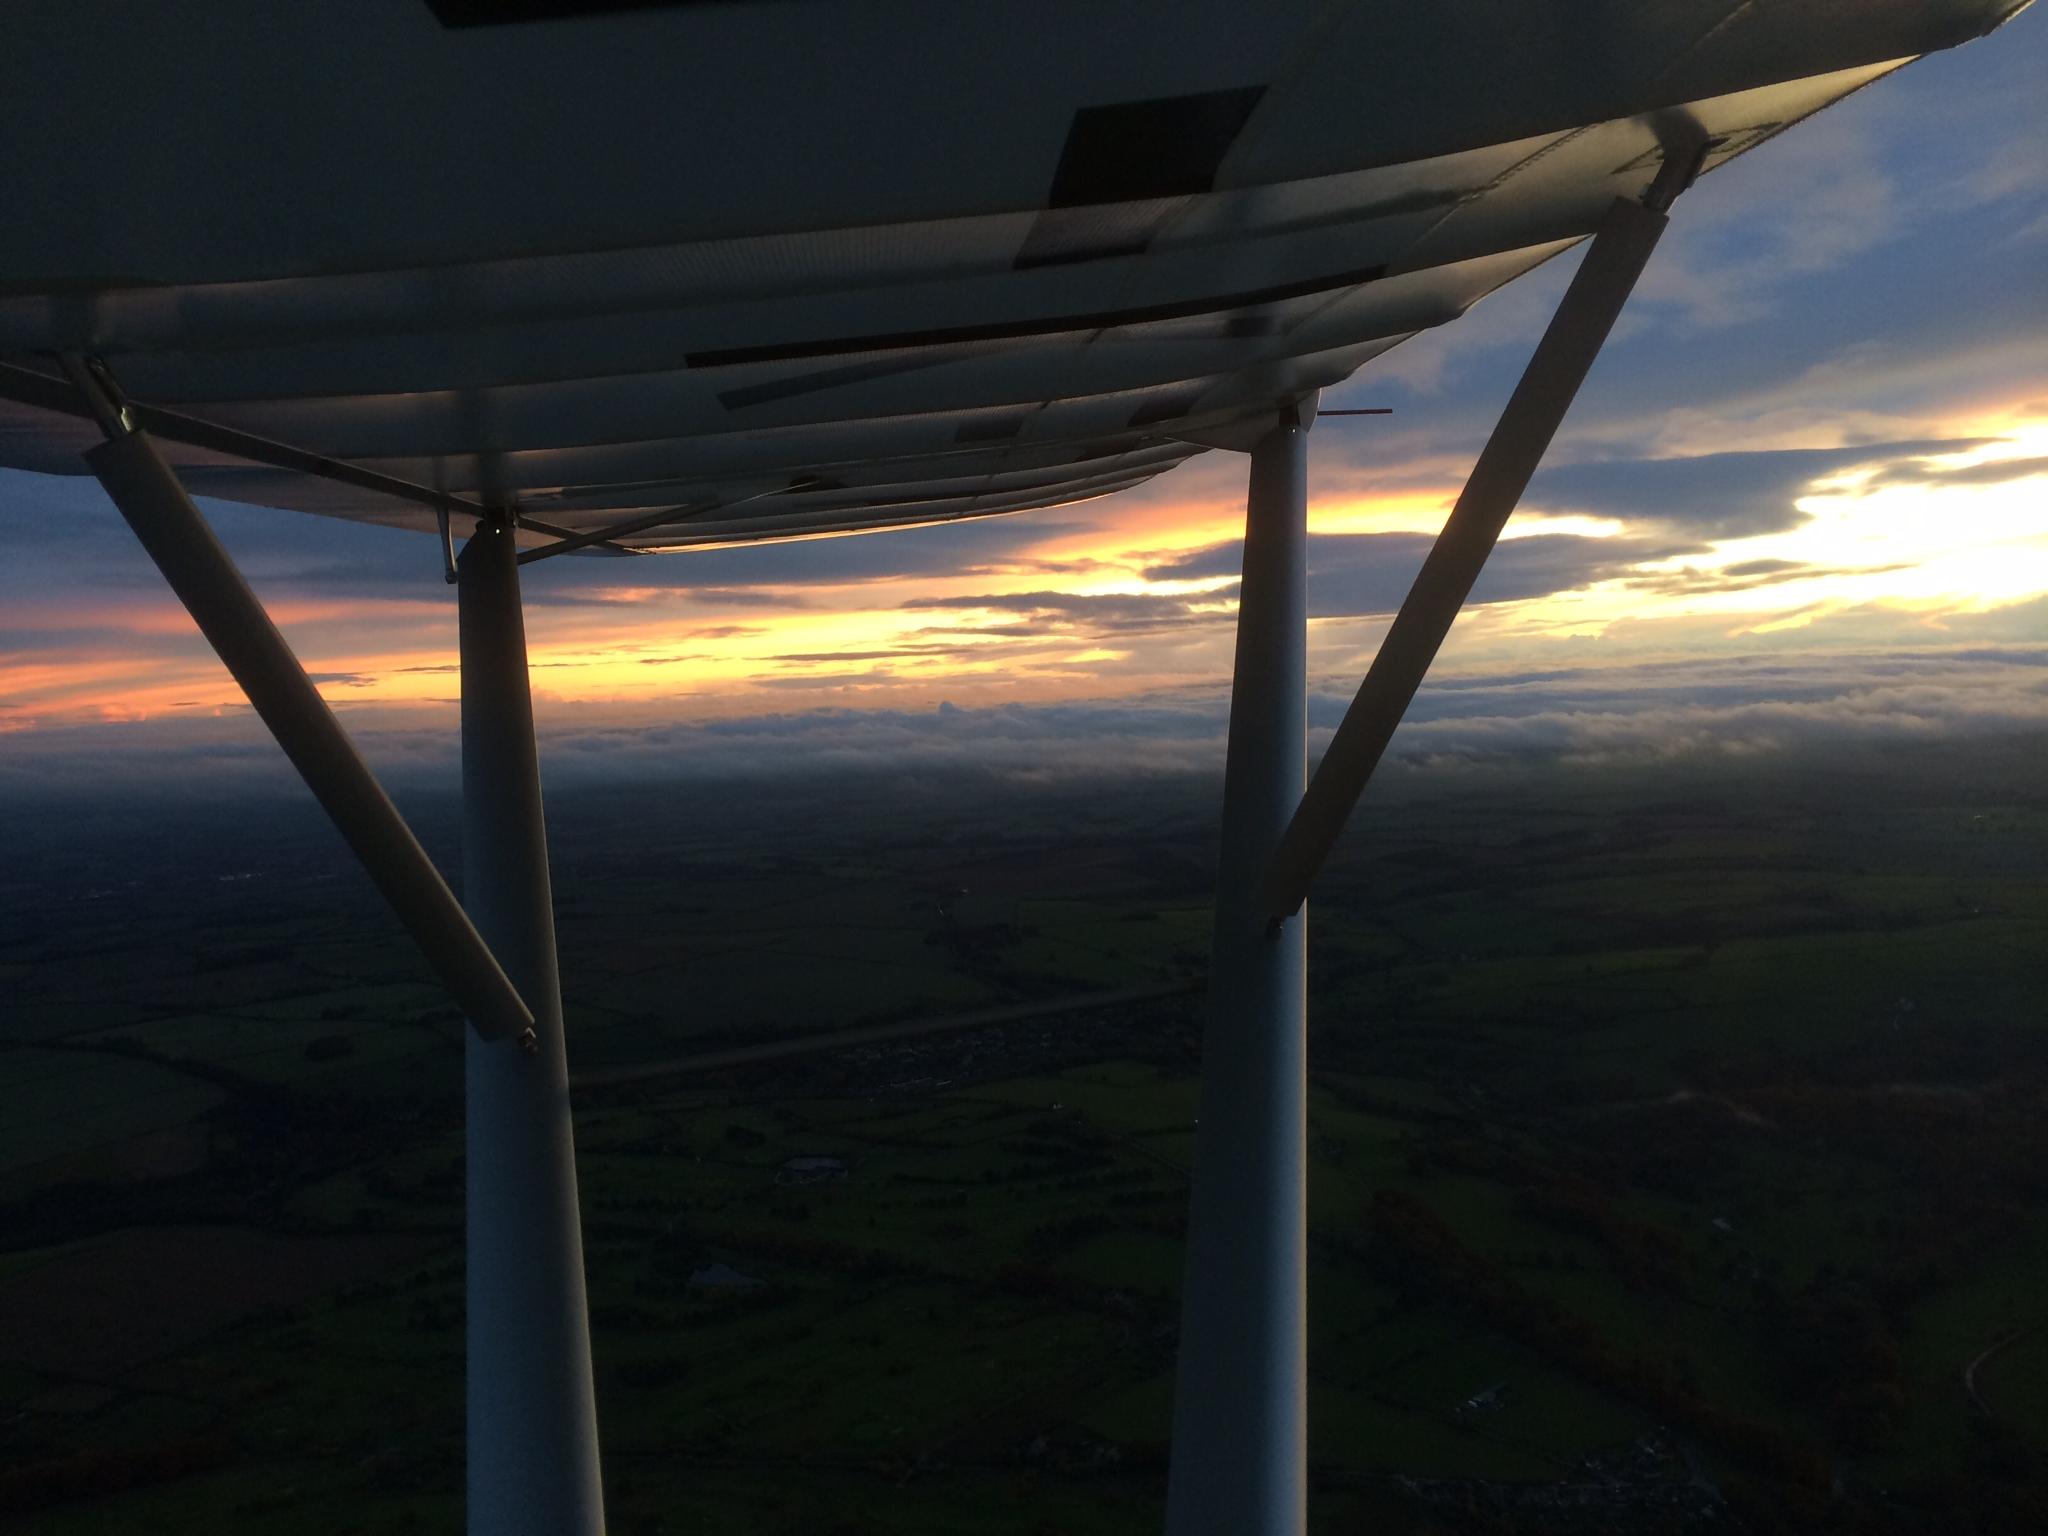 sunset-in-the-c42.jpg